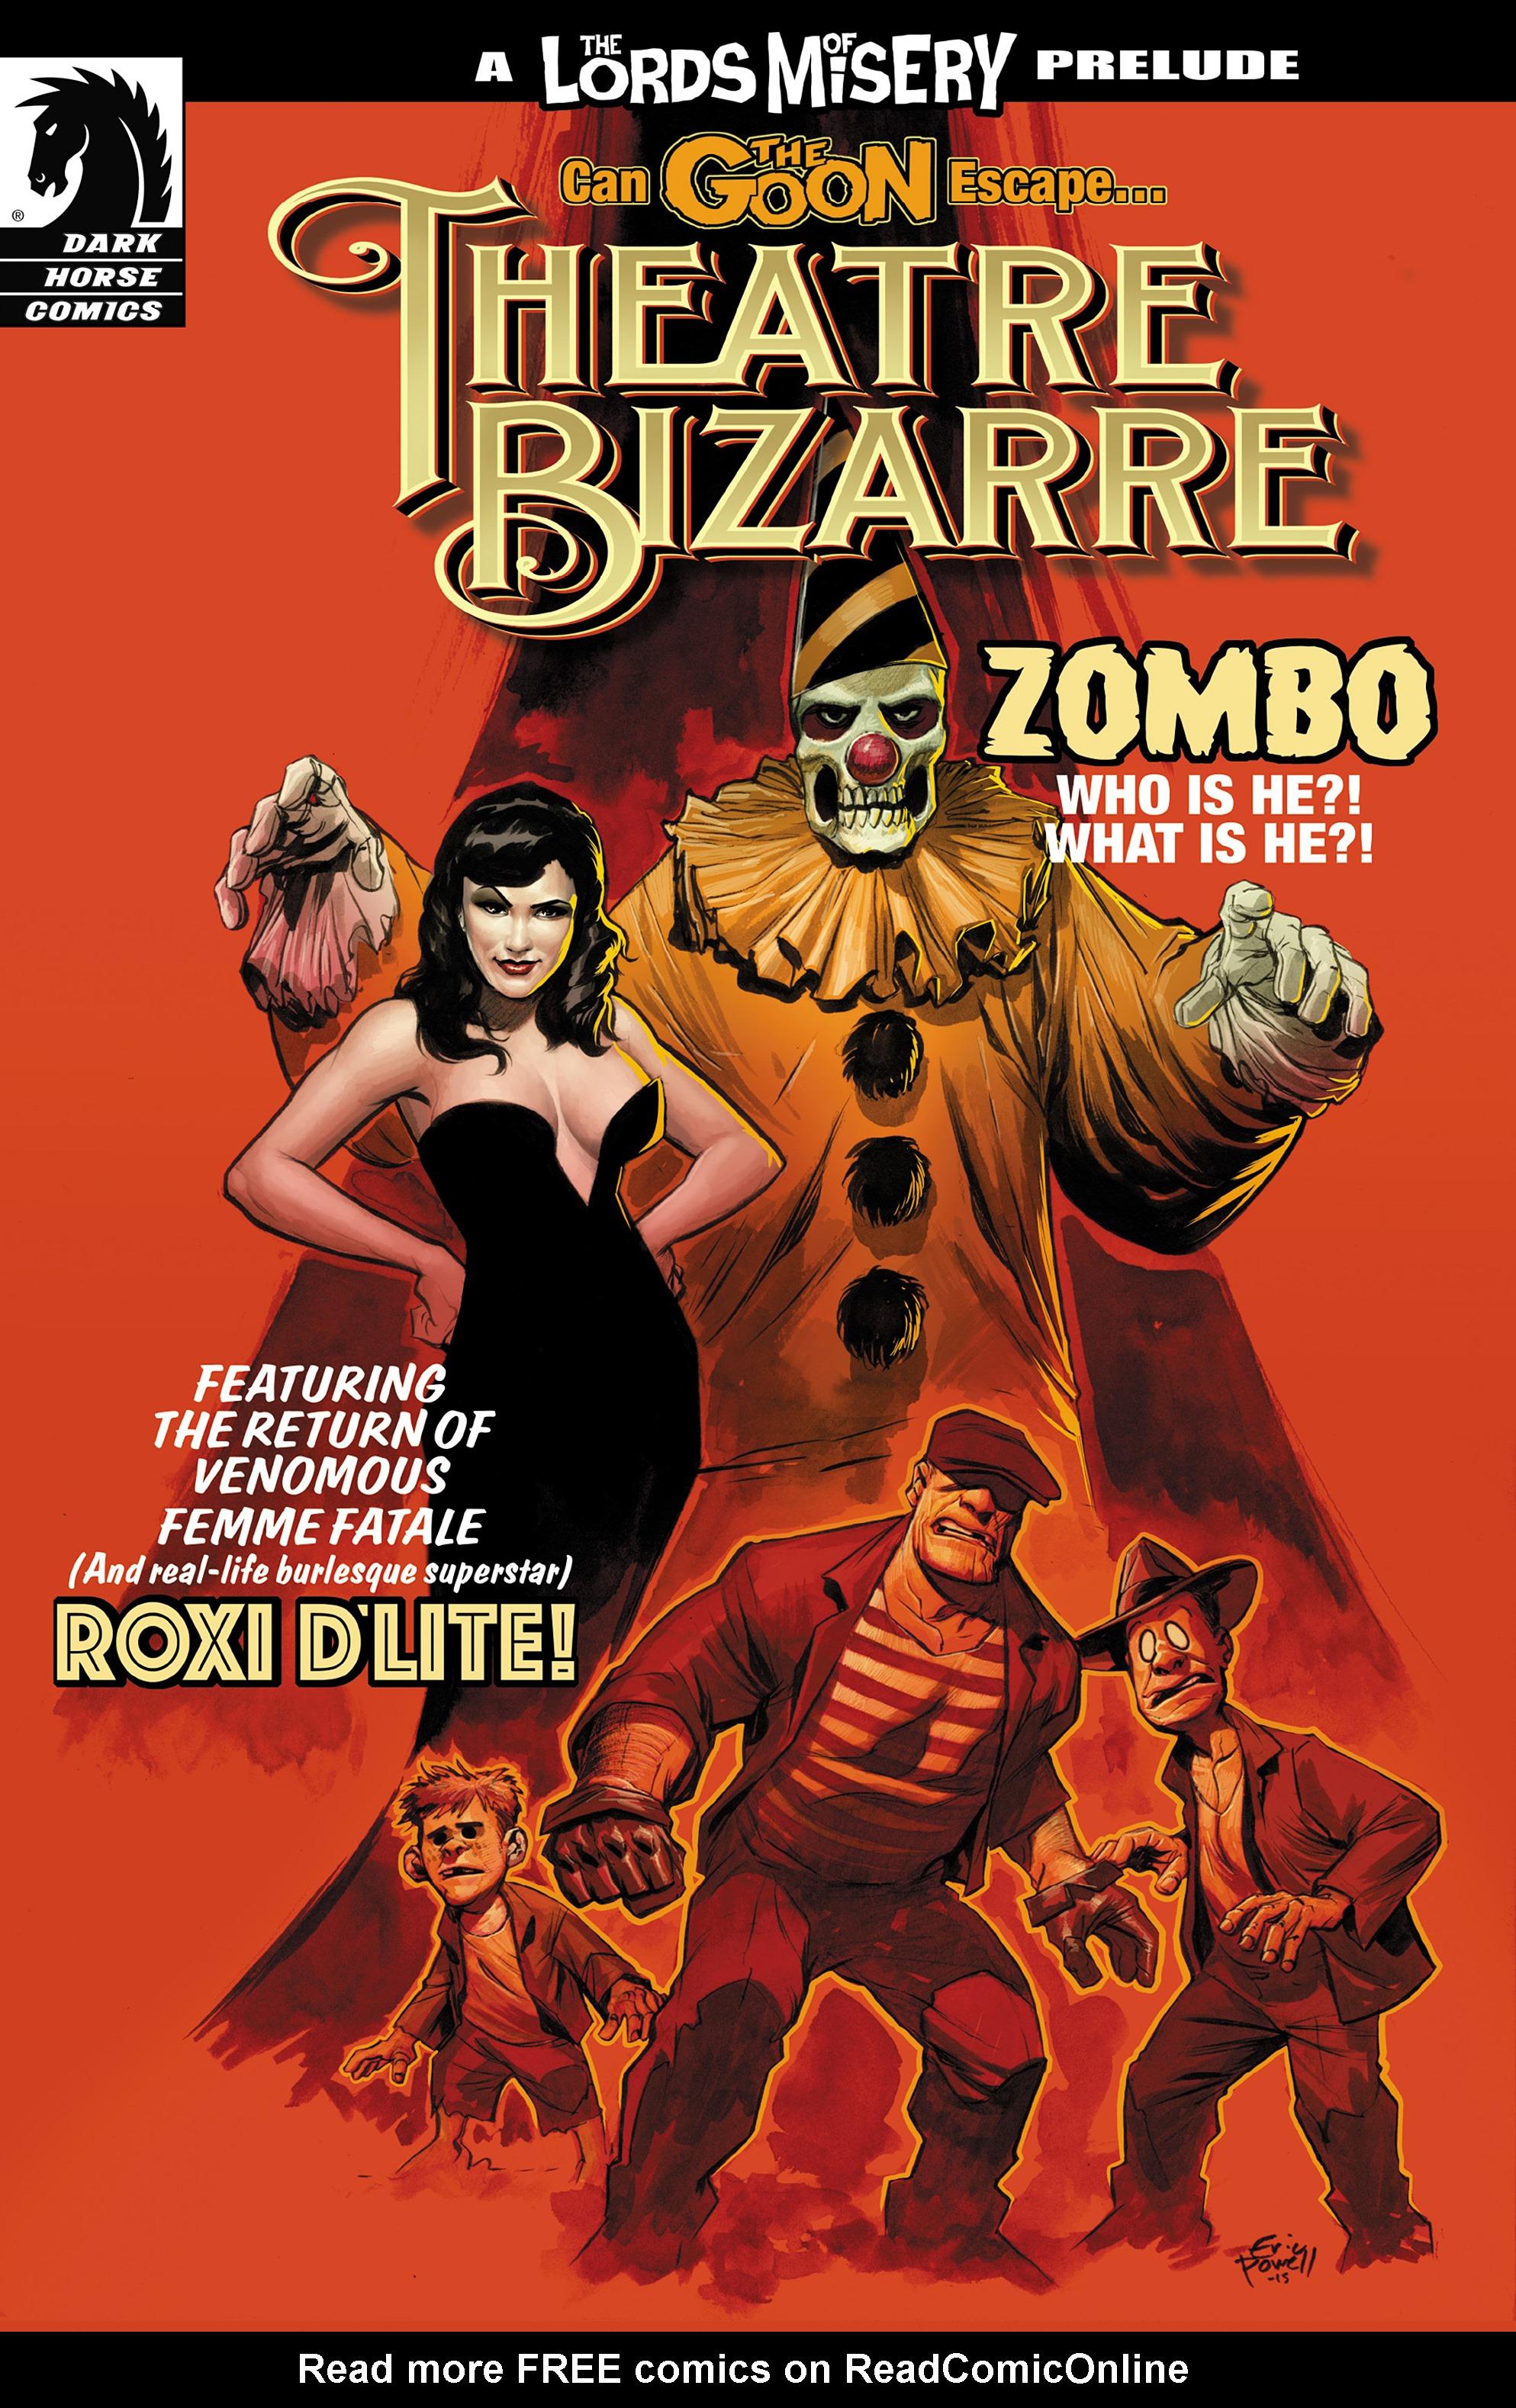 Read online The Goon: Theatre Bizarre comic -  Issue # Full - 1